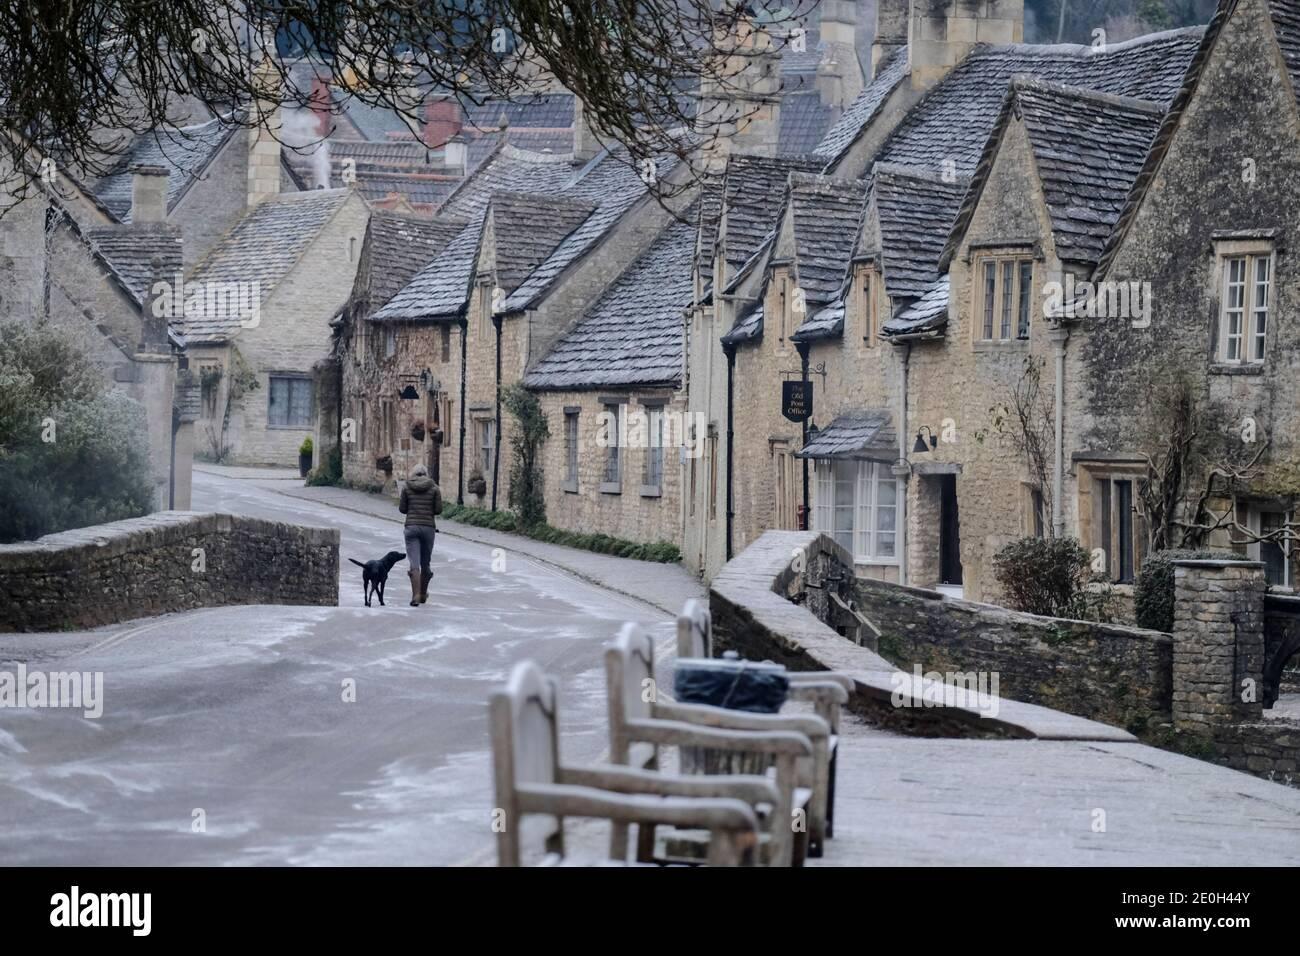 castle-combe-wiltshire-uk-1st-jan-2021-w